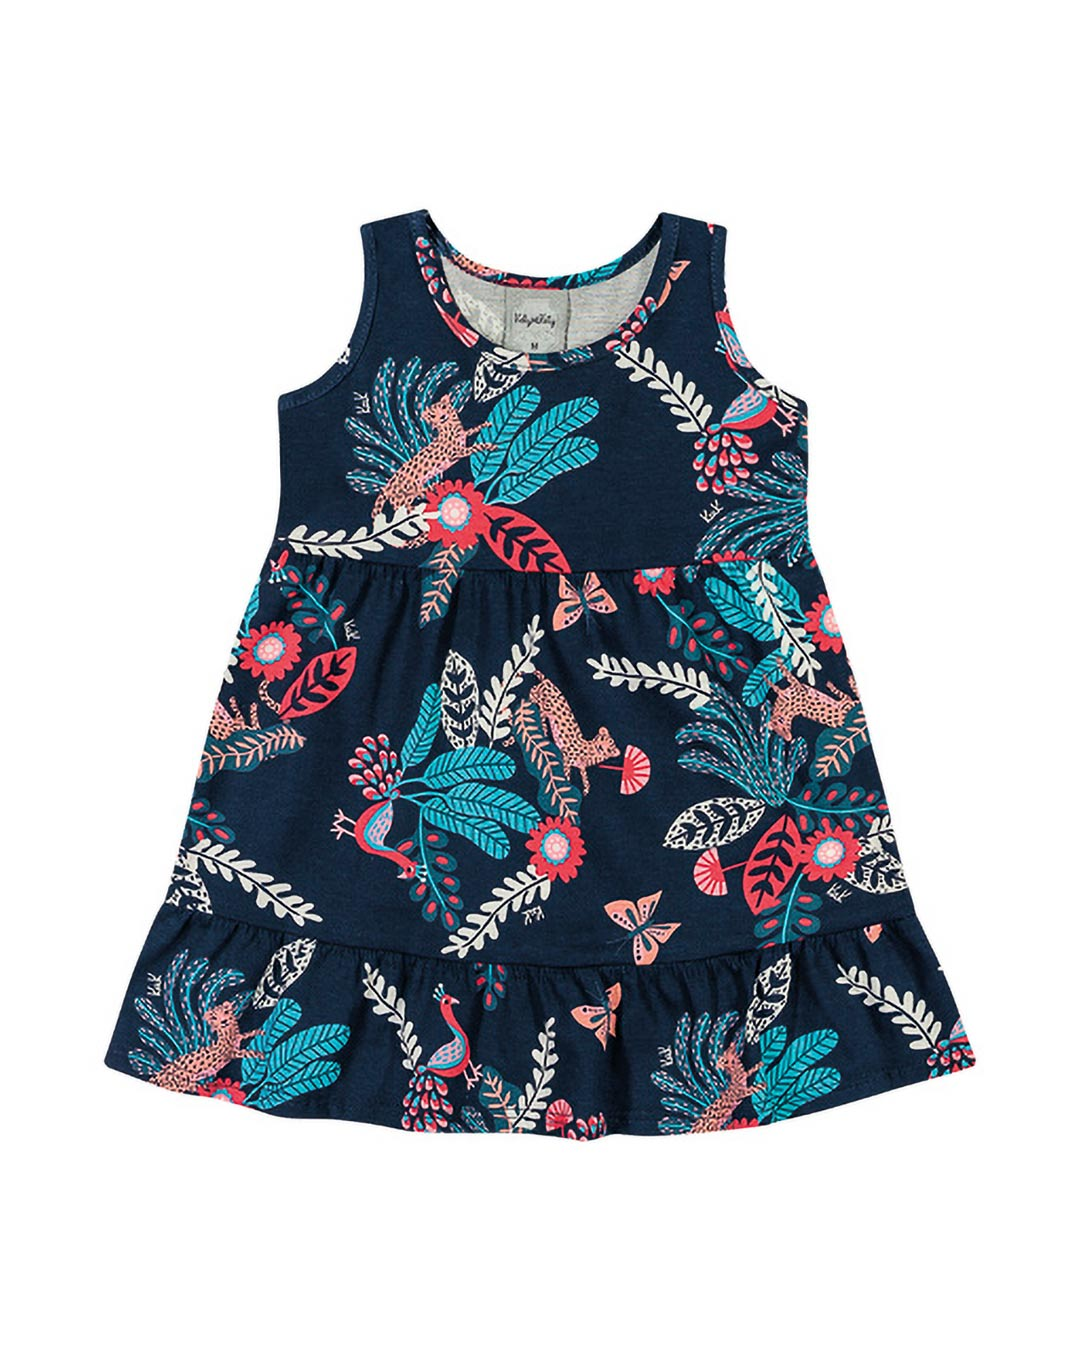 Vestido Bebê e Infantil Floral - Kely & Kety